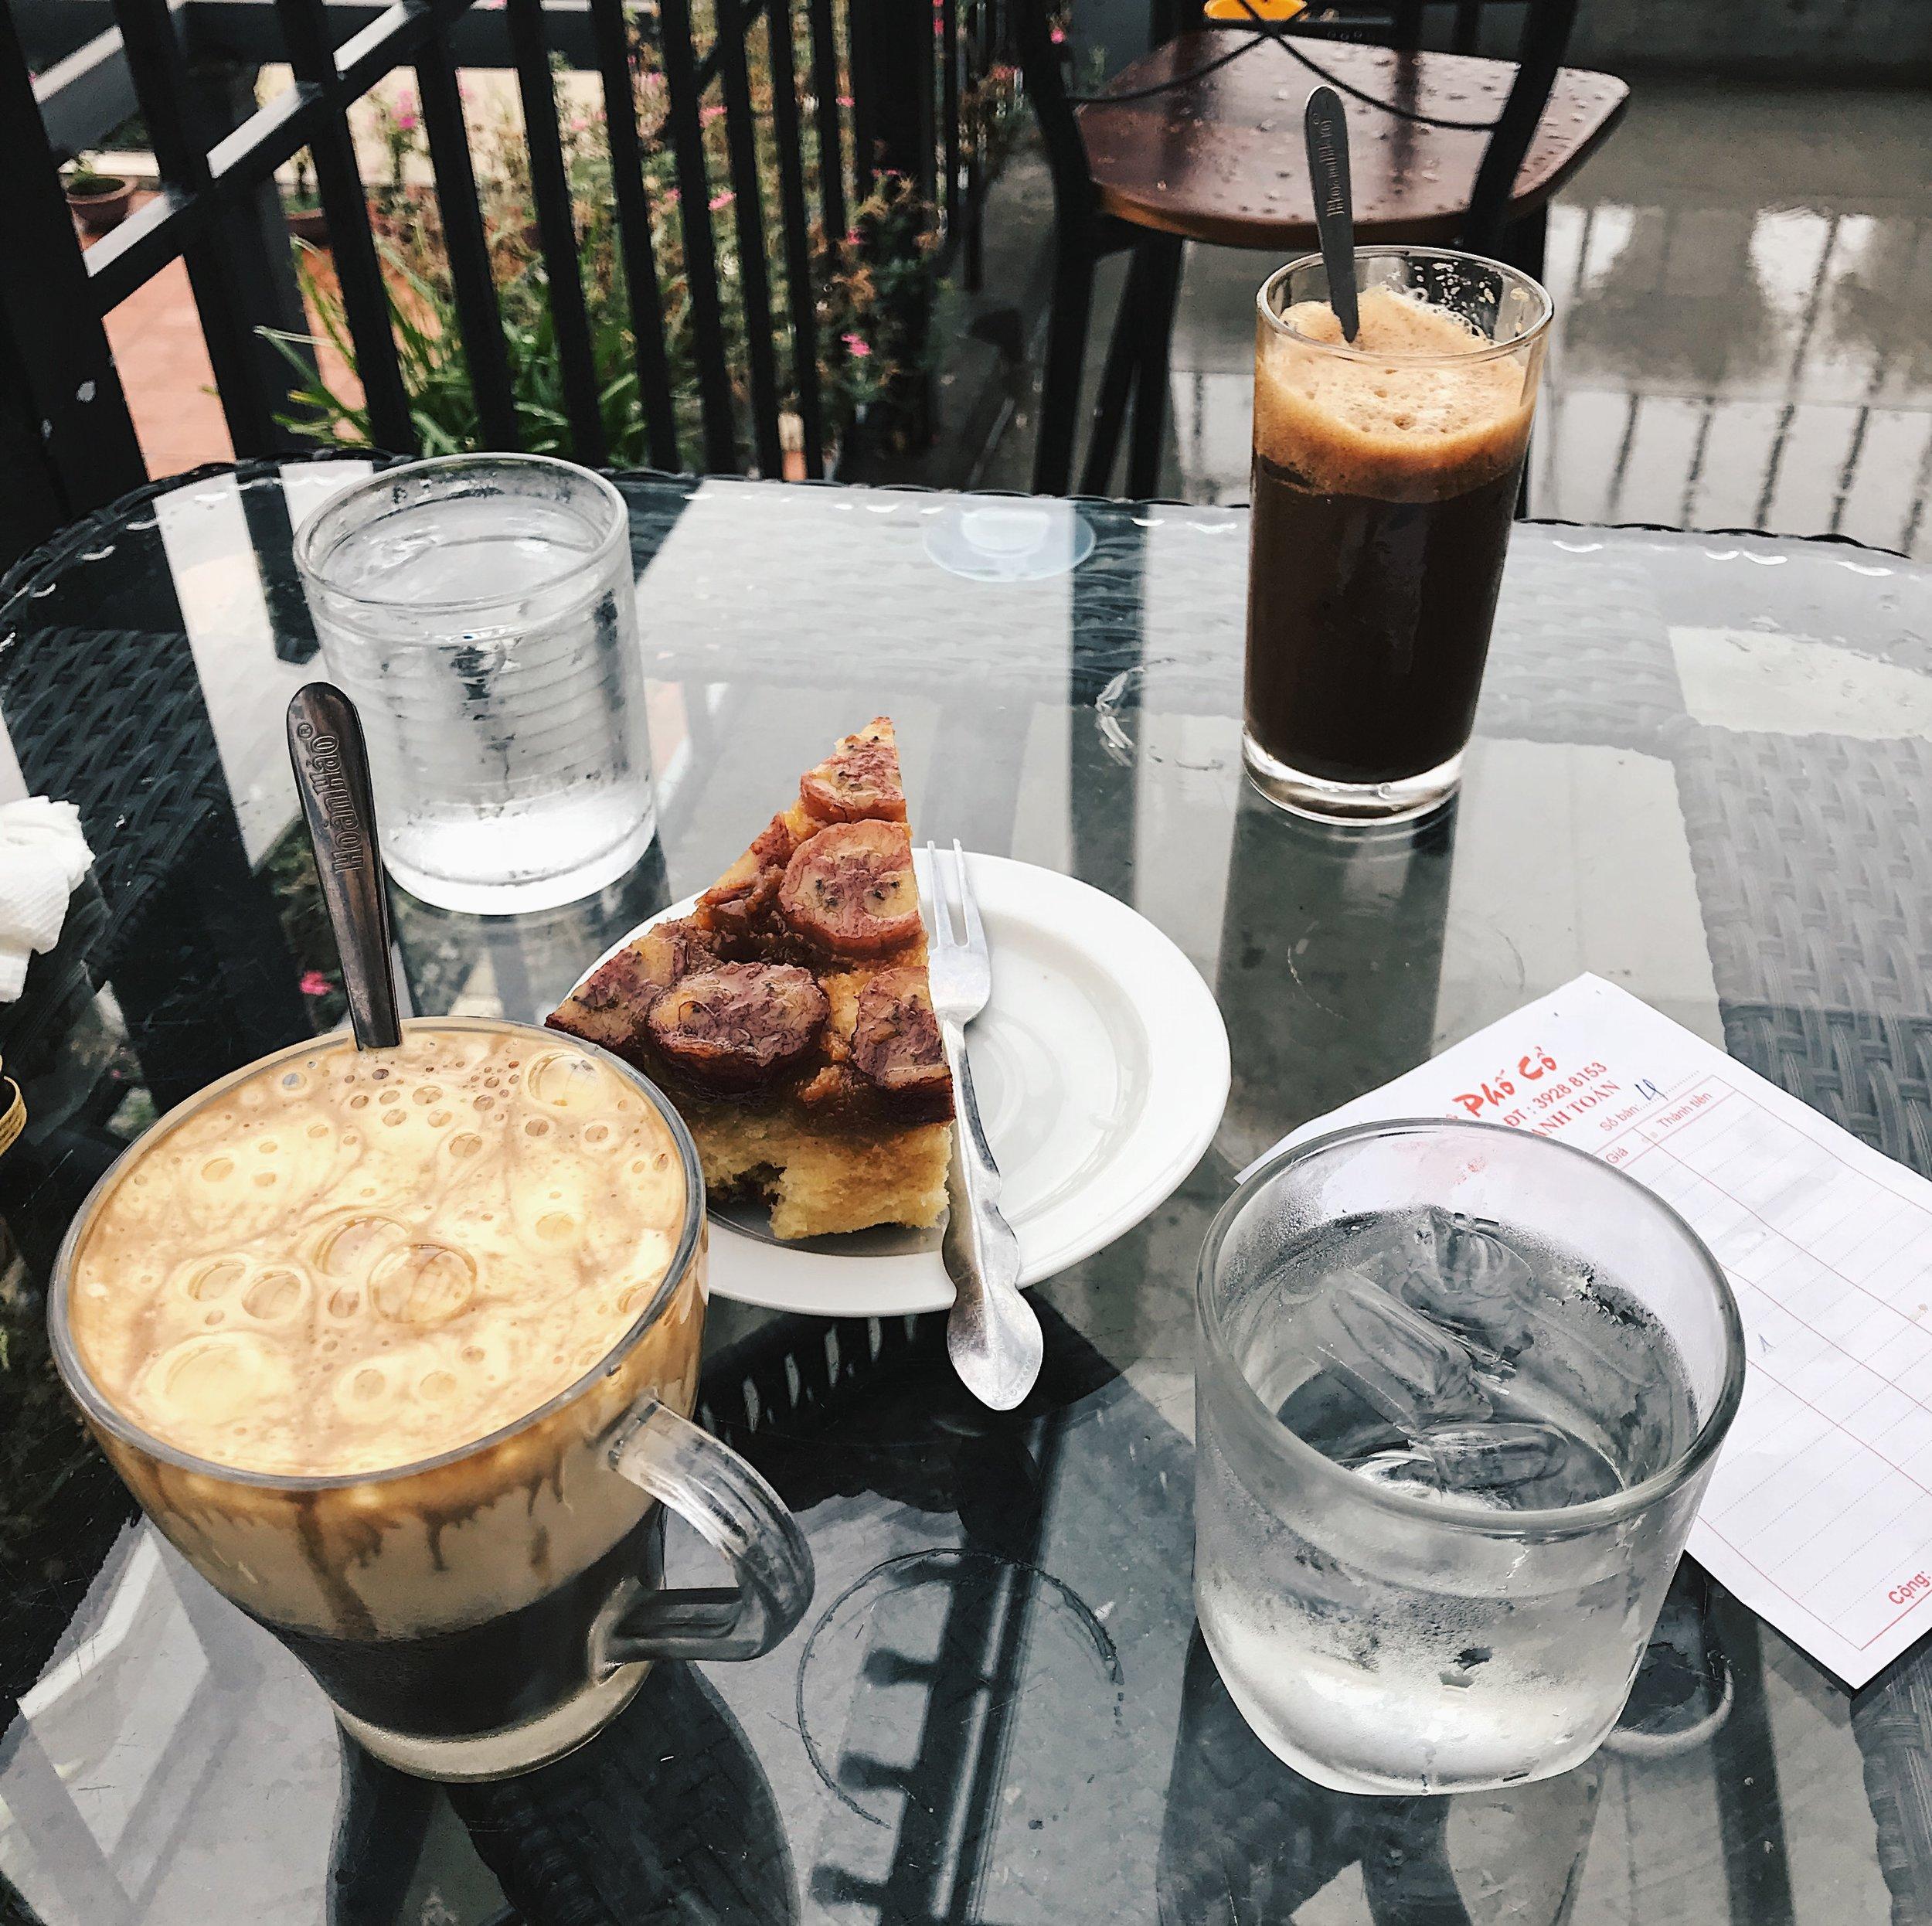 Breakfast at Cafe Pho Co overlooking Hoan Kiem Lake